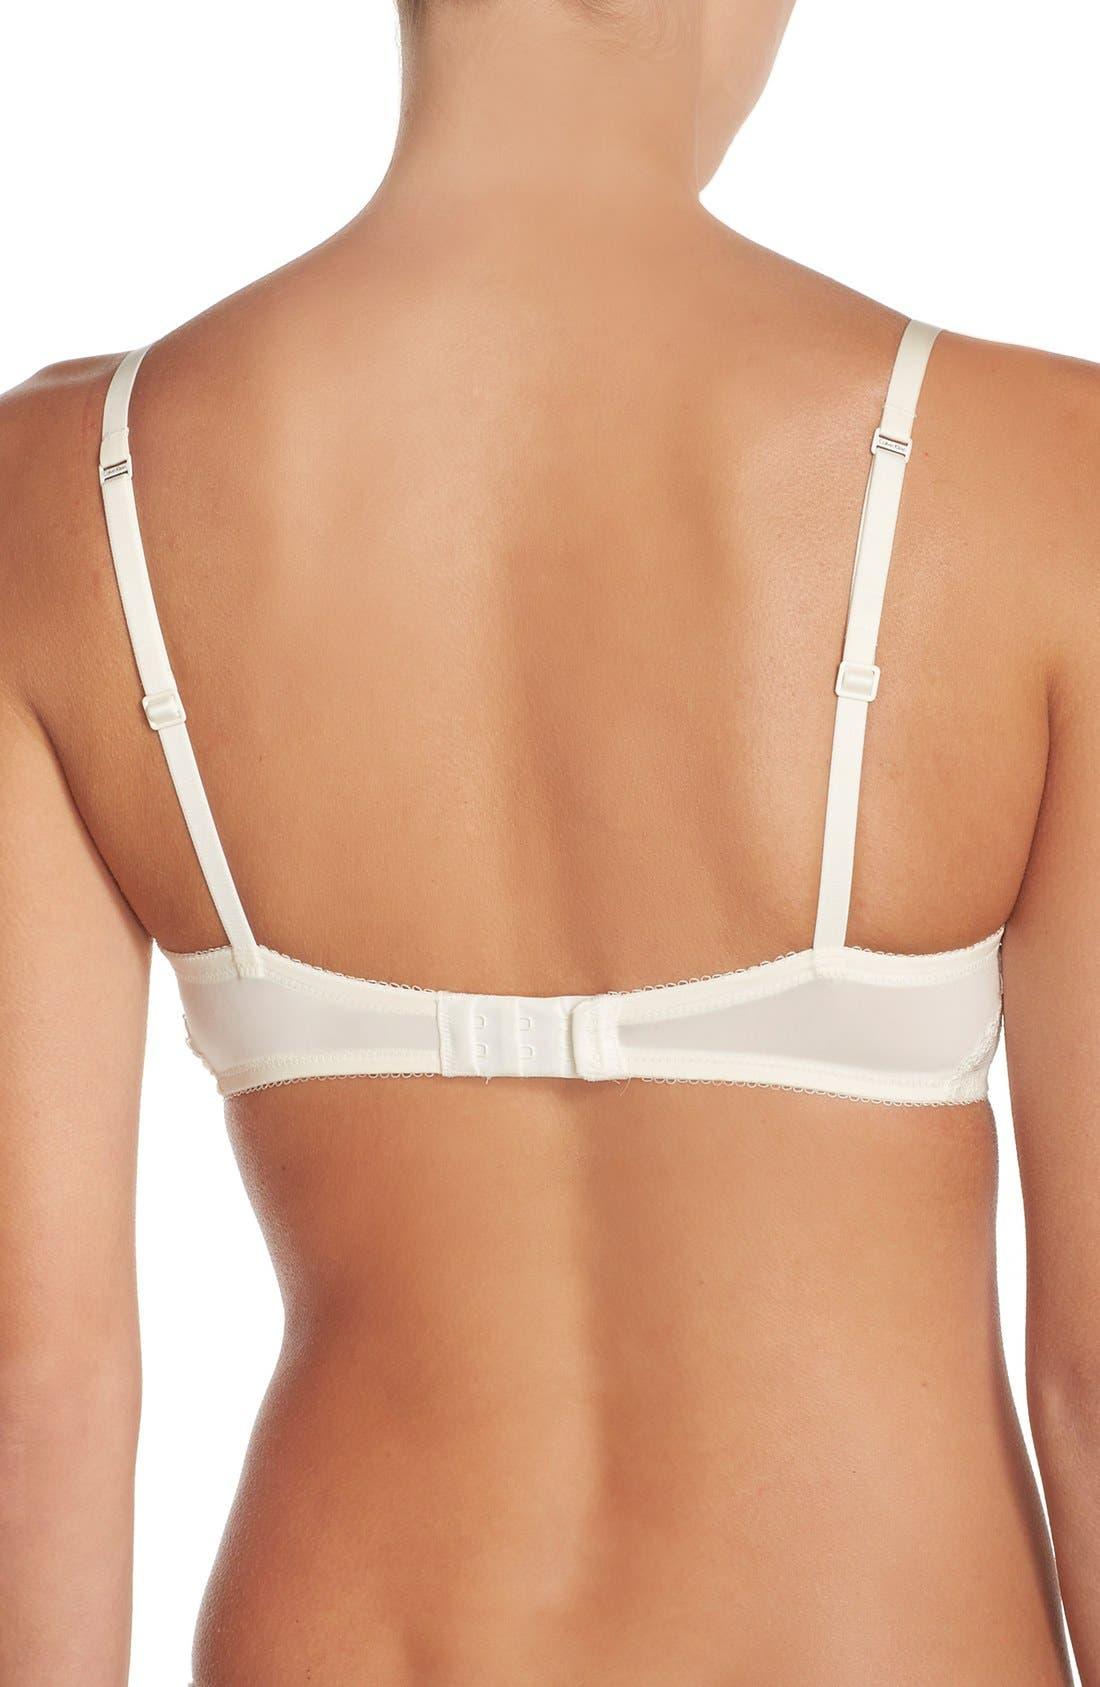 Alternate Image 2  - Calvin Klein 'Sensual' Underwire Balconette Bra